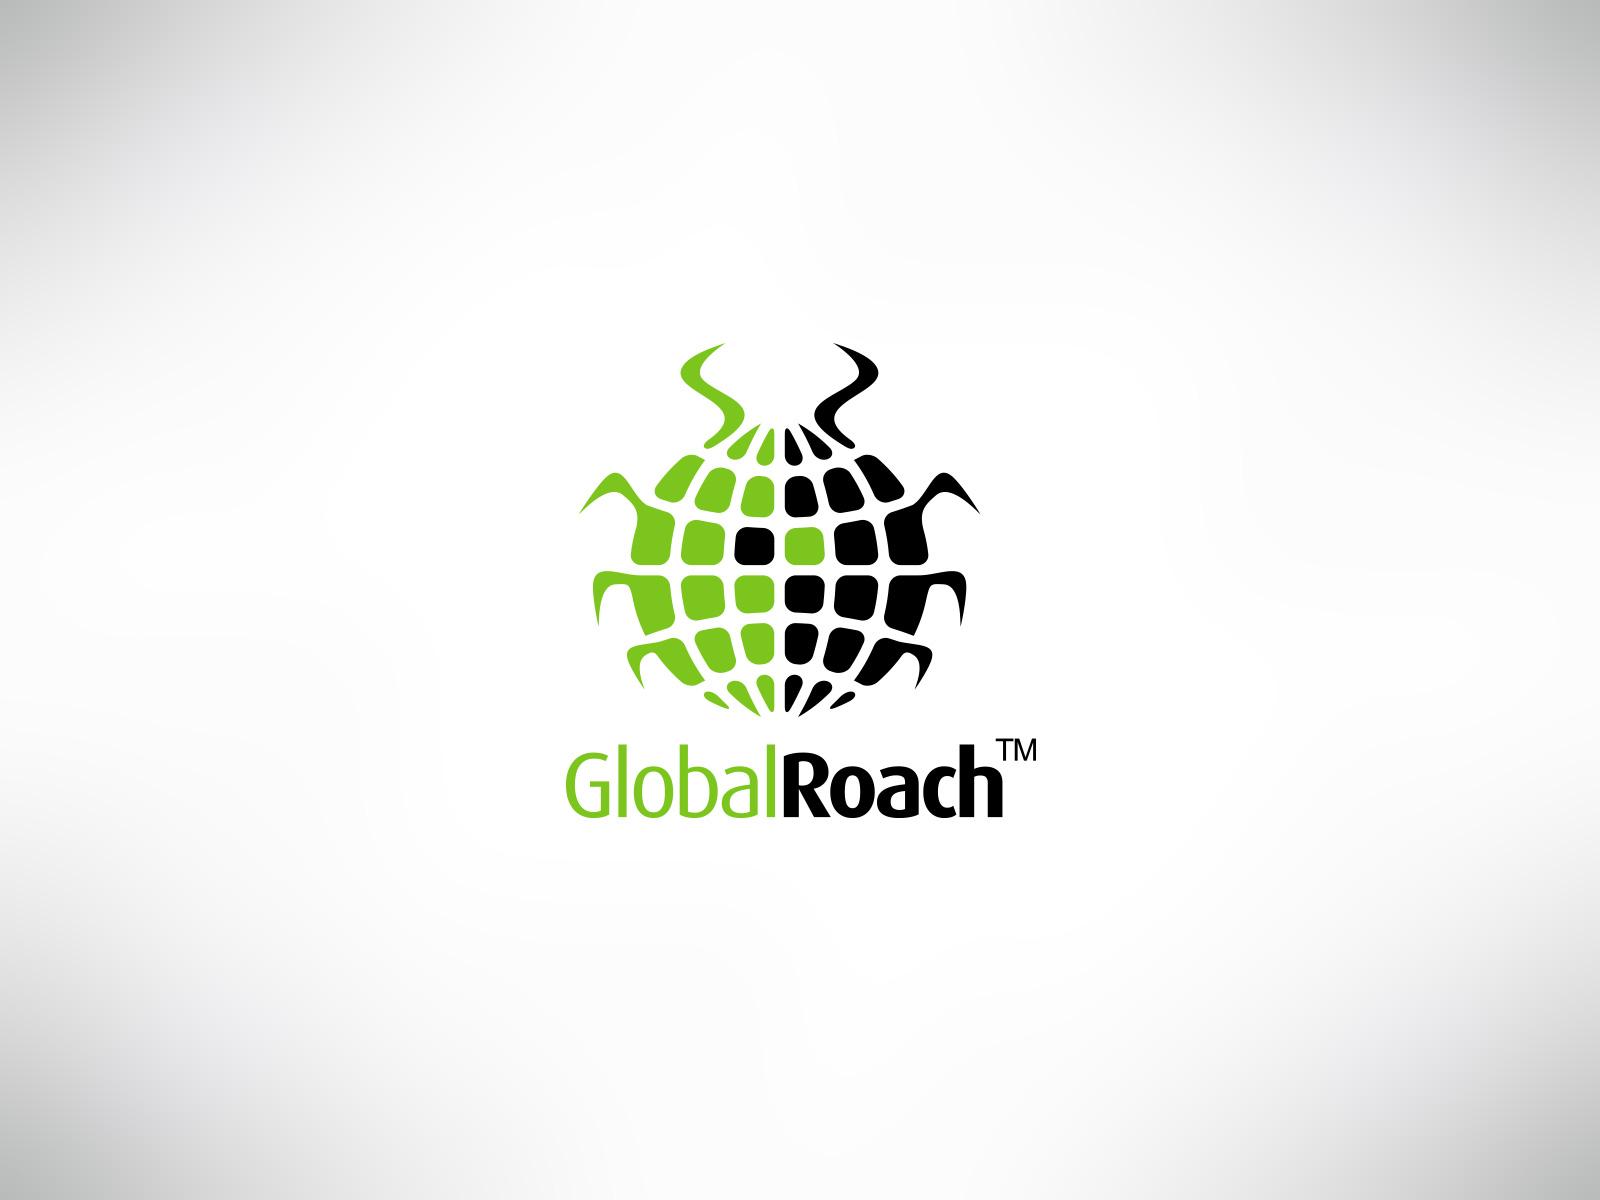 Global roach logo